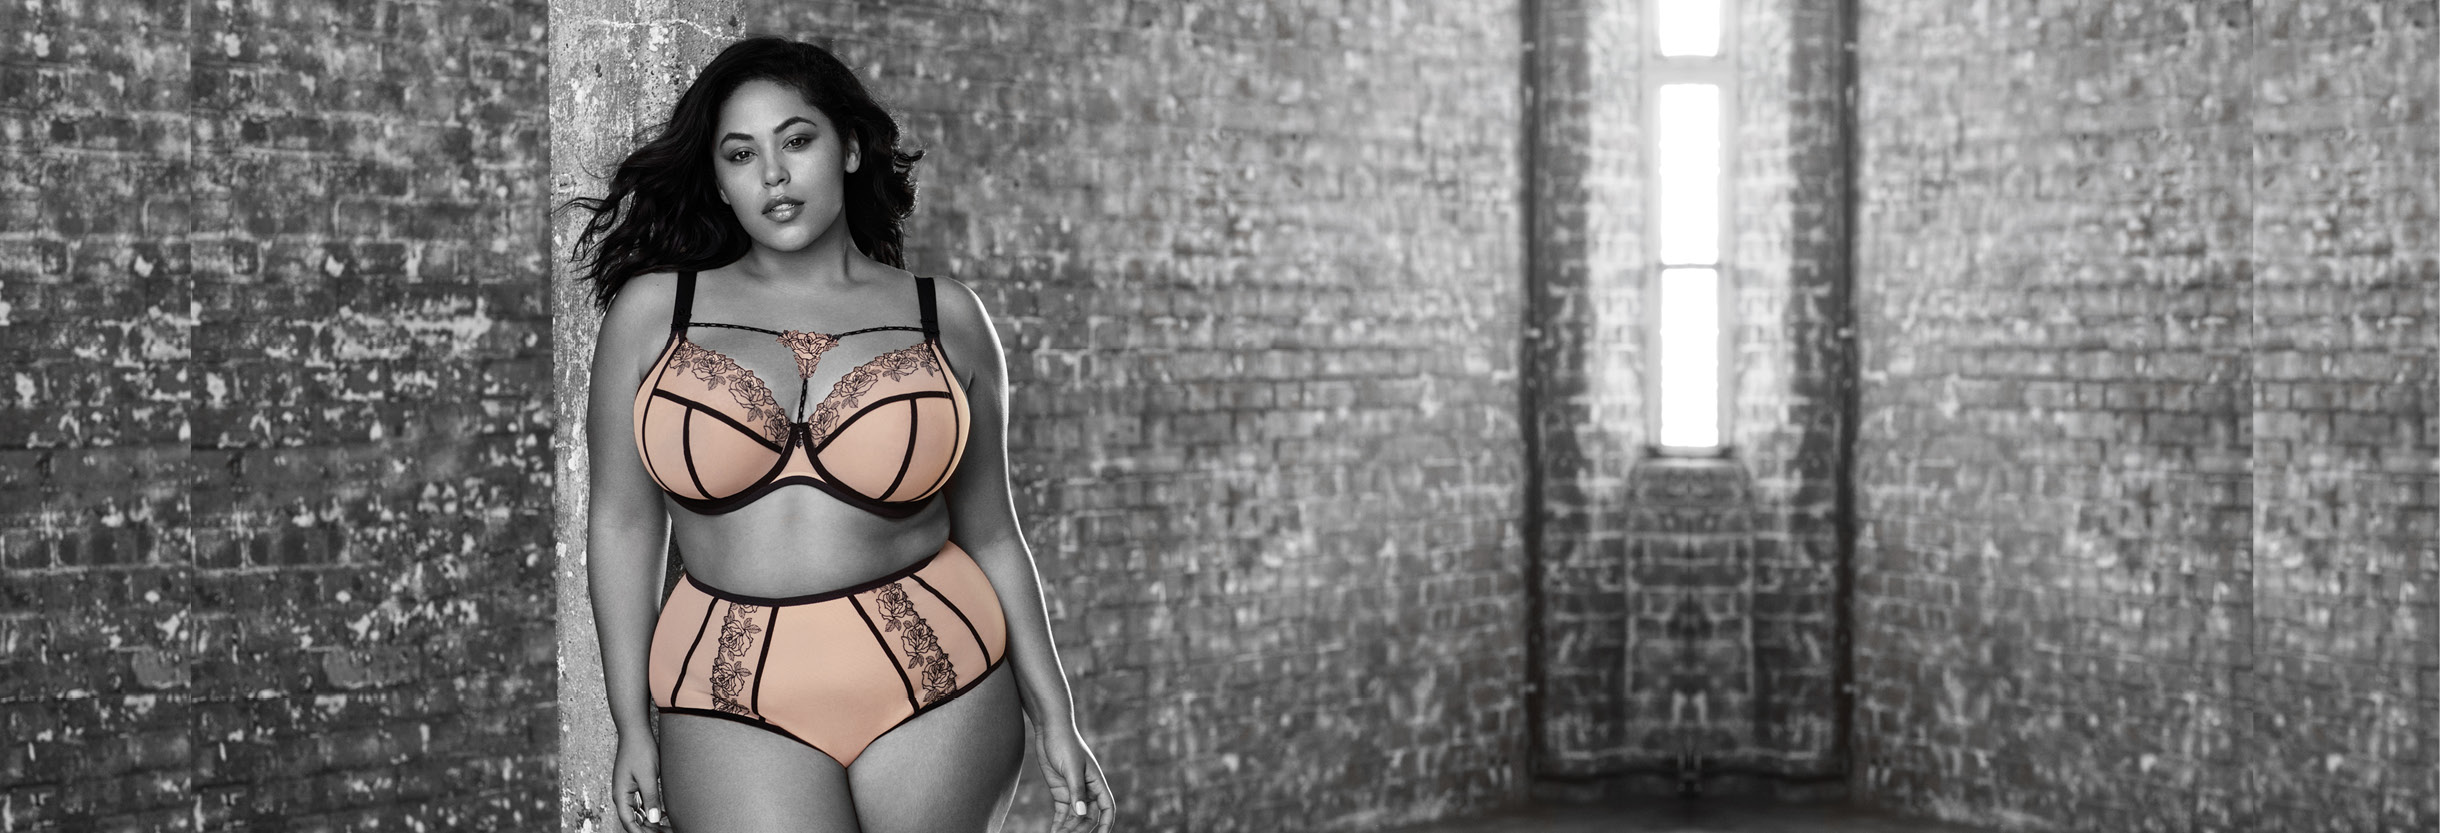 Elomi lingerie grote maten Elomi Tori online kopen bij Naron